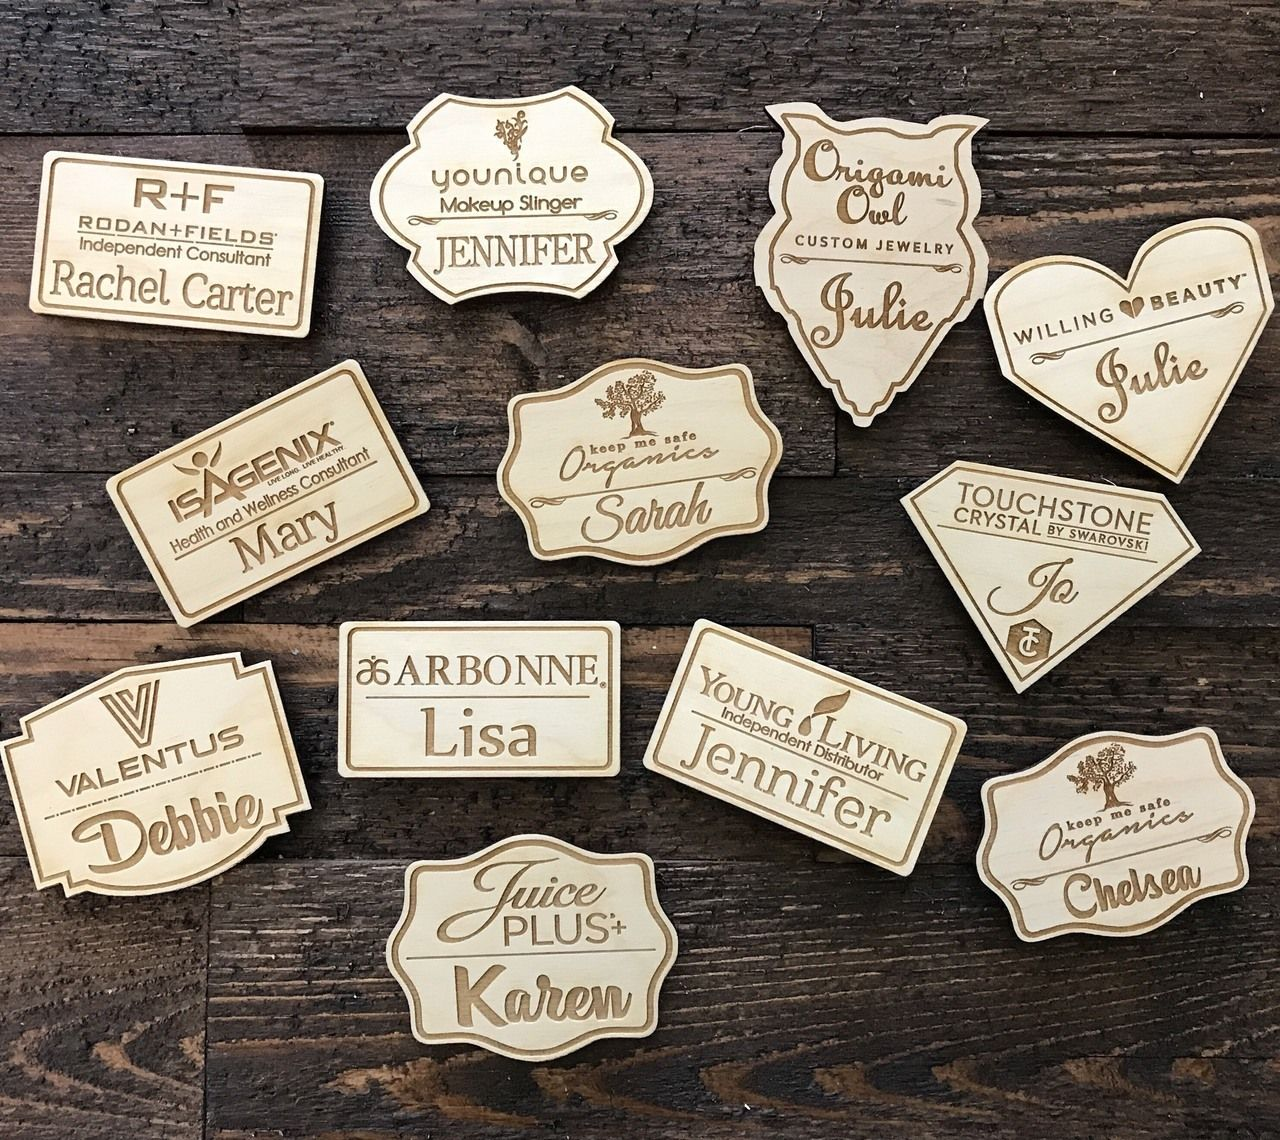 Name Tag Laser Engraved On Wood Direct Sales Mlm Lularoe Lemongrass Spa Legalshield Primerica Arbonne Laser Engraving Personalized Engraved Gifts Name Tags